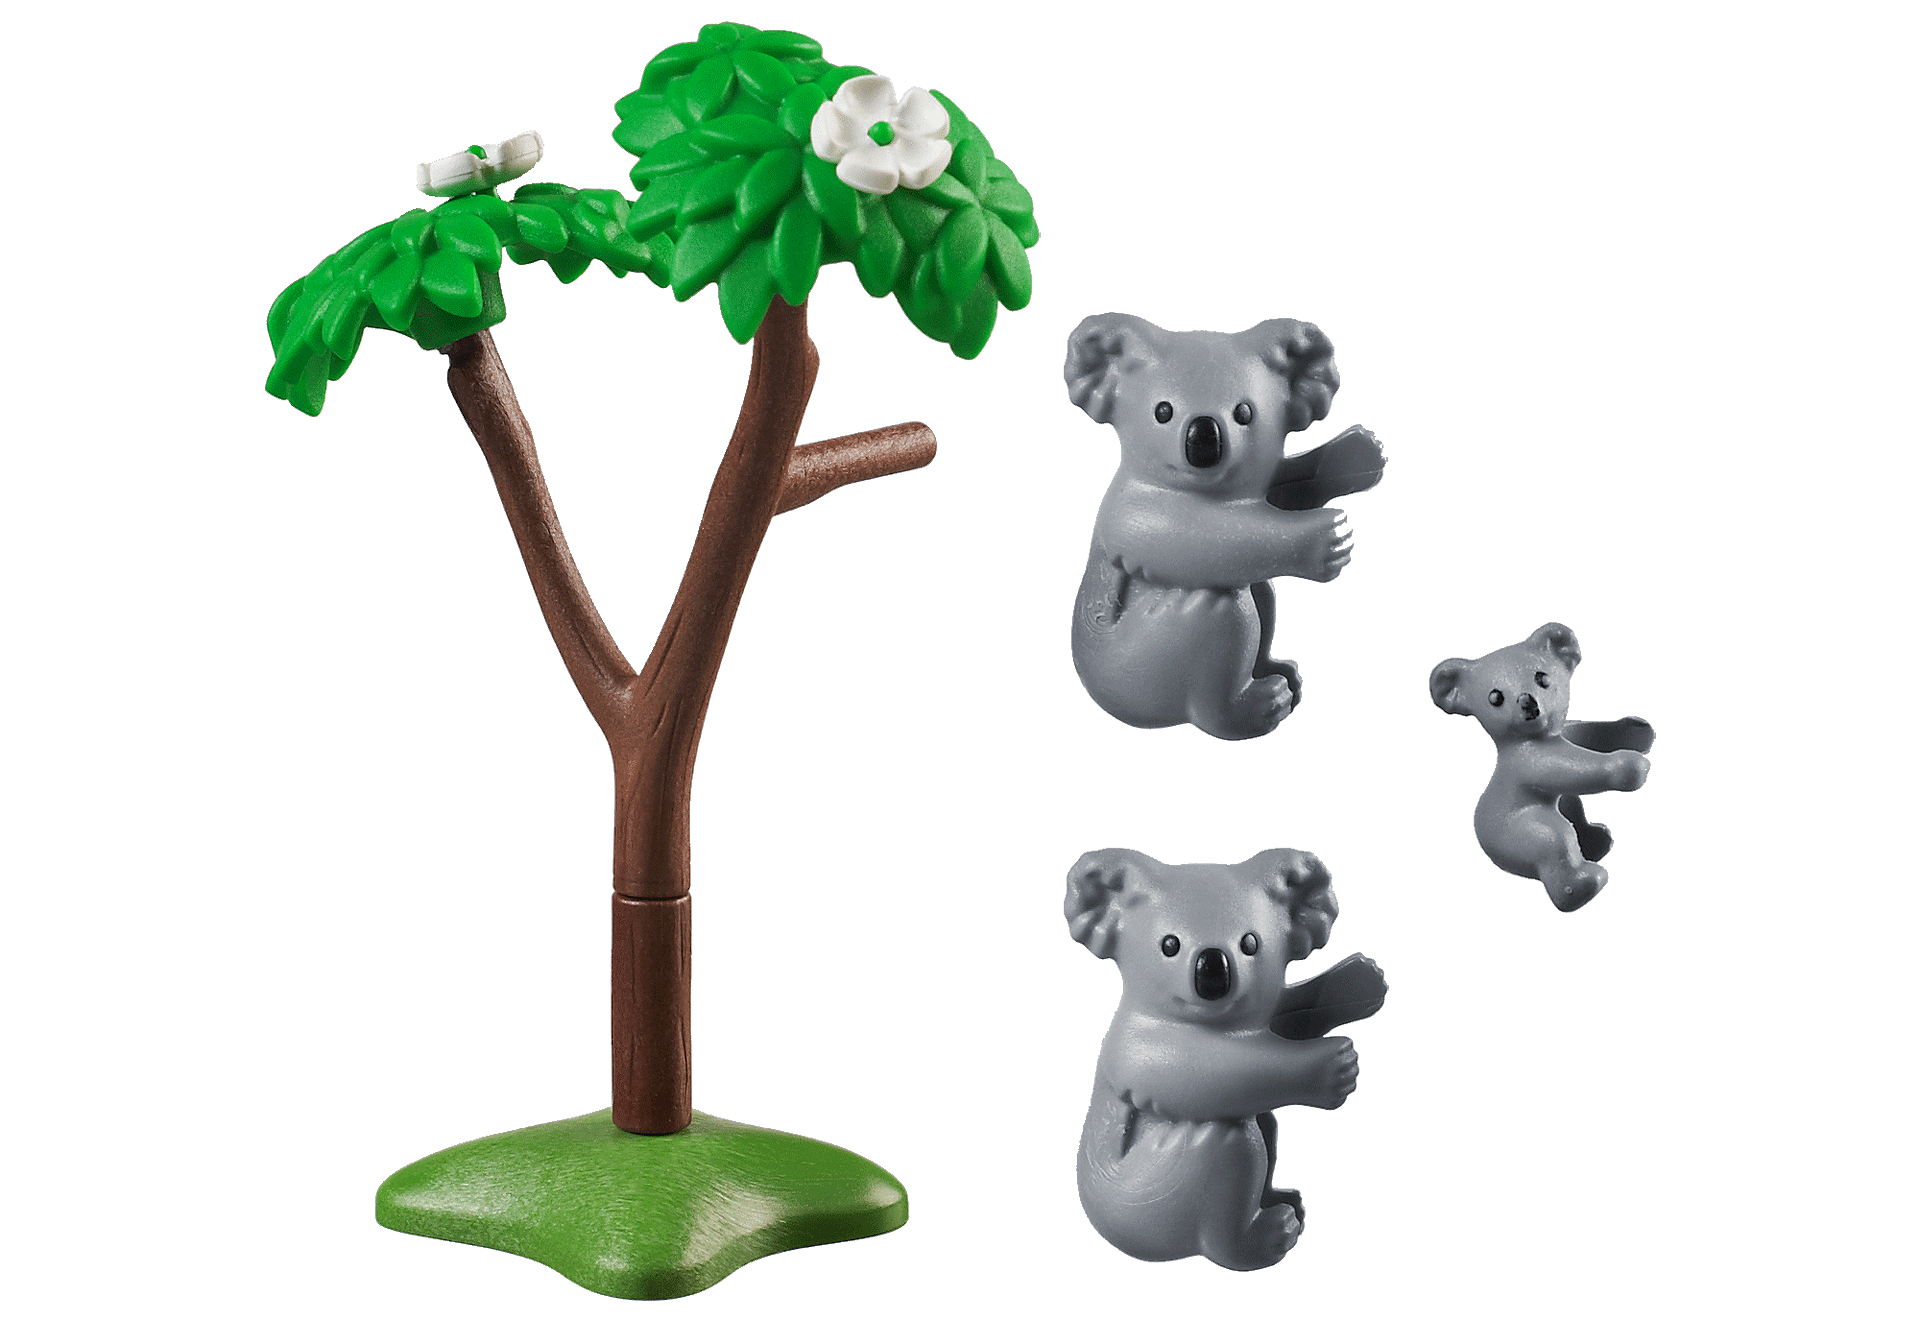 70352 Koalas with Baby zoom image3